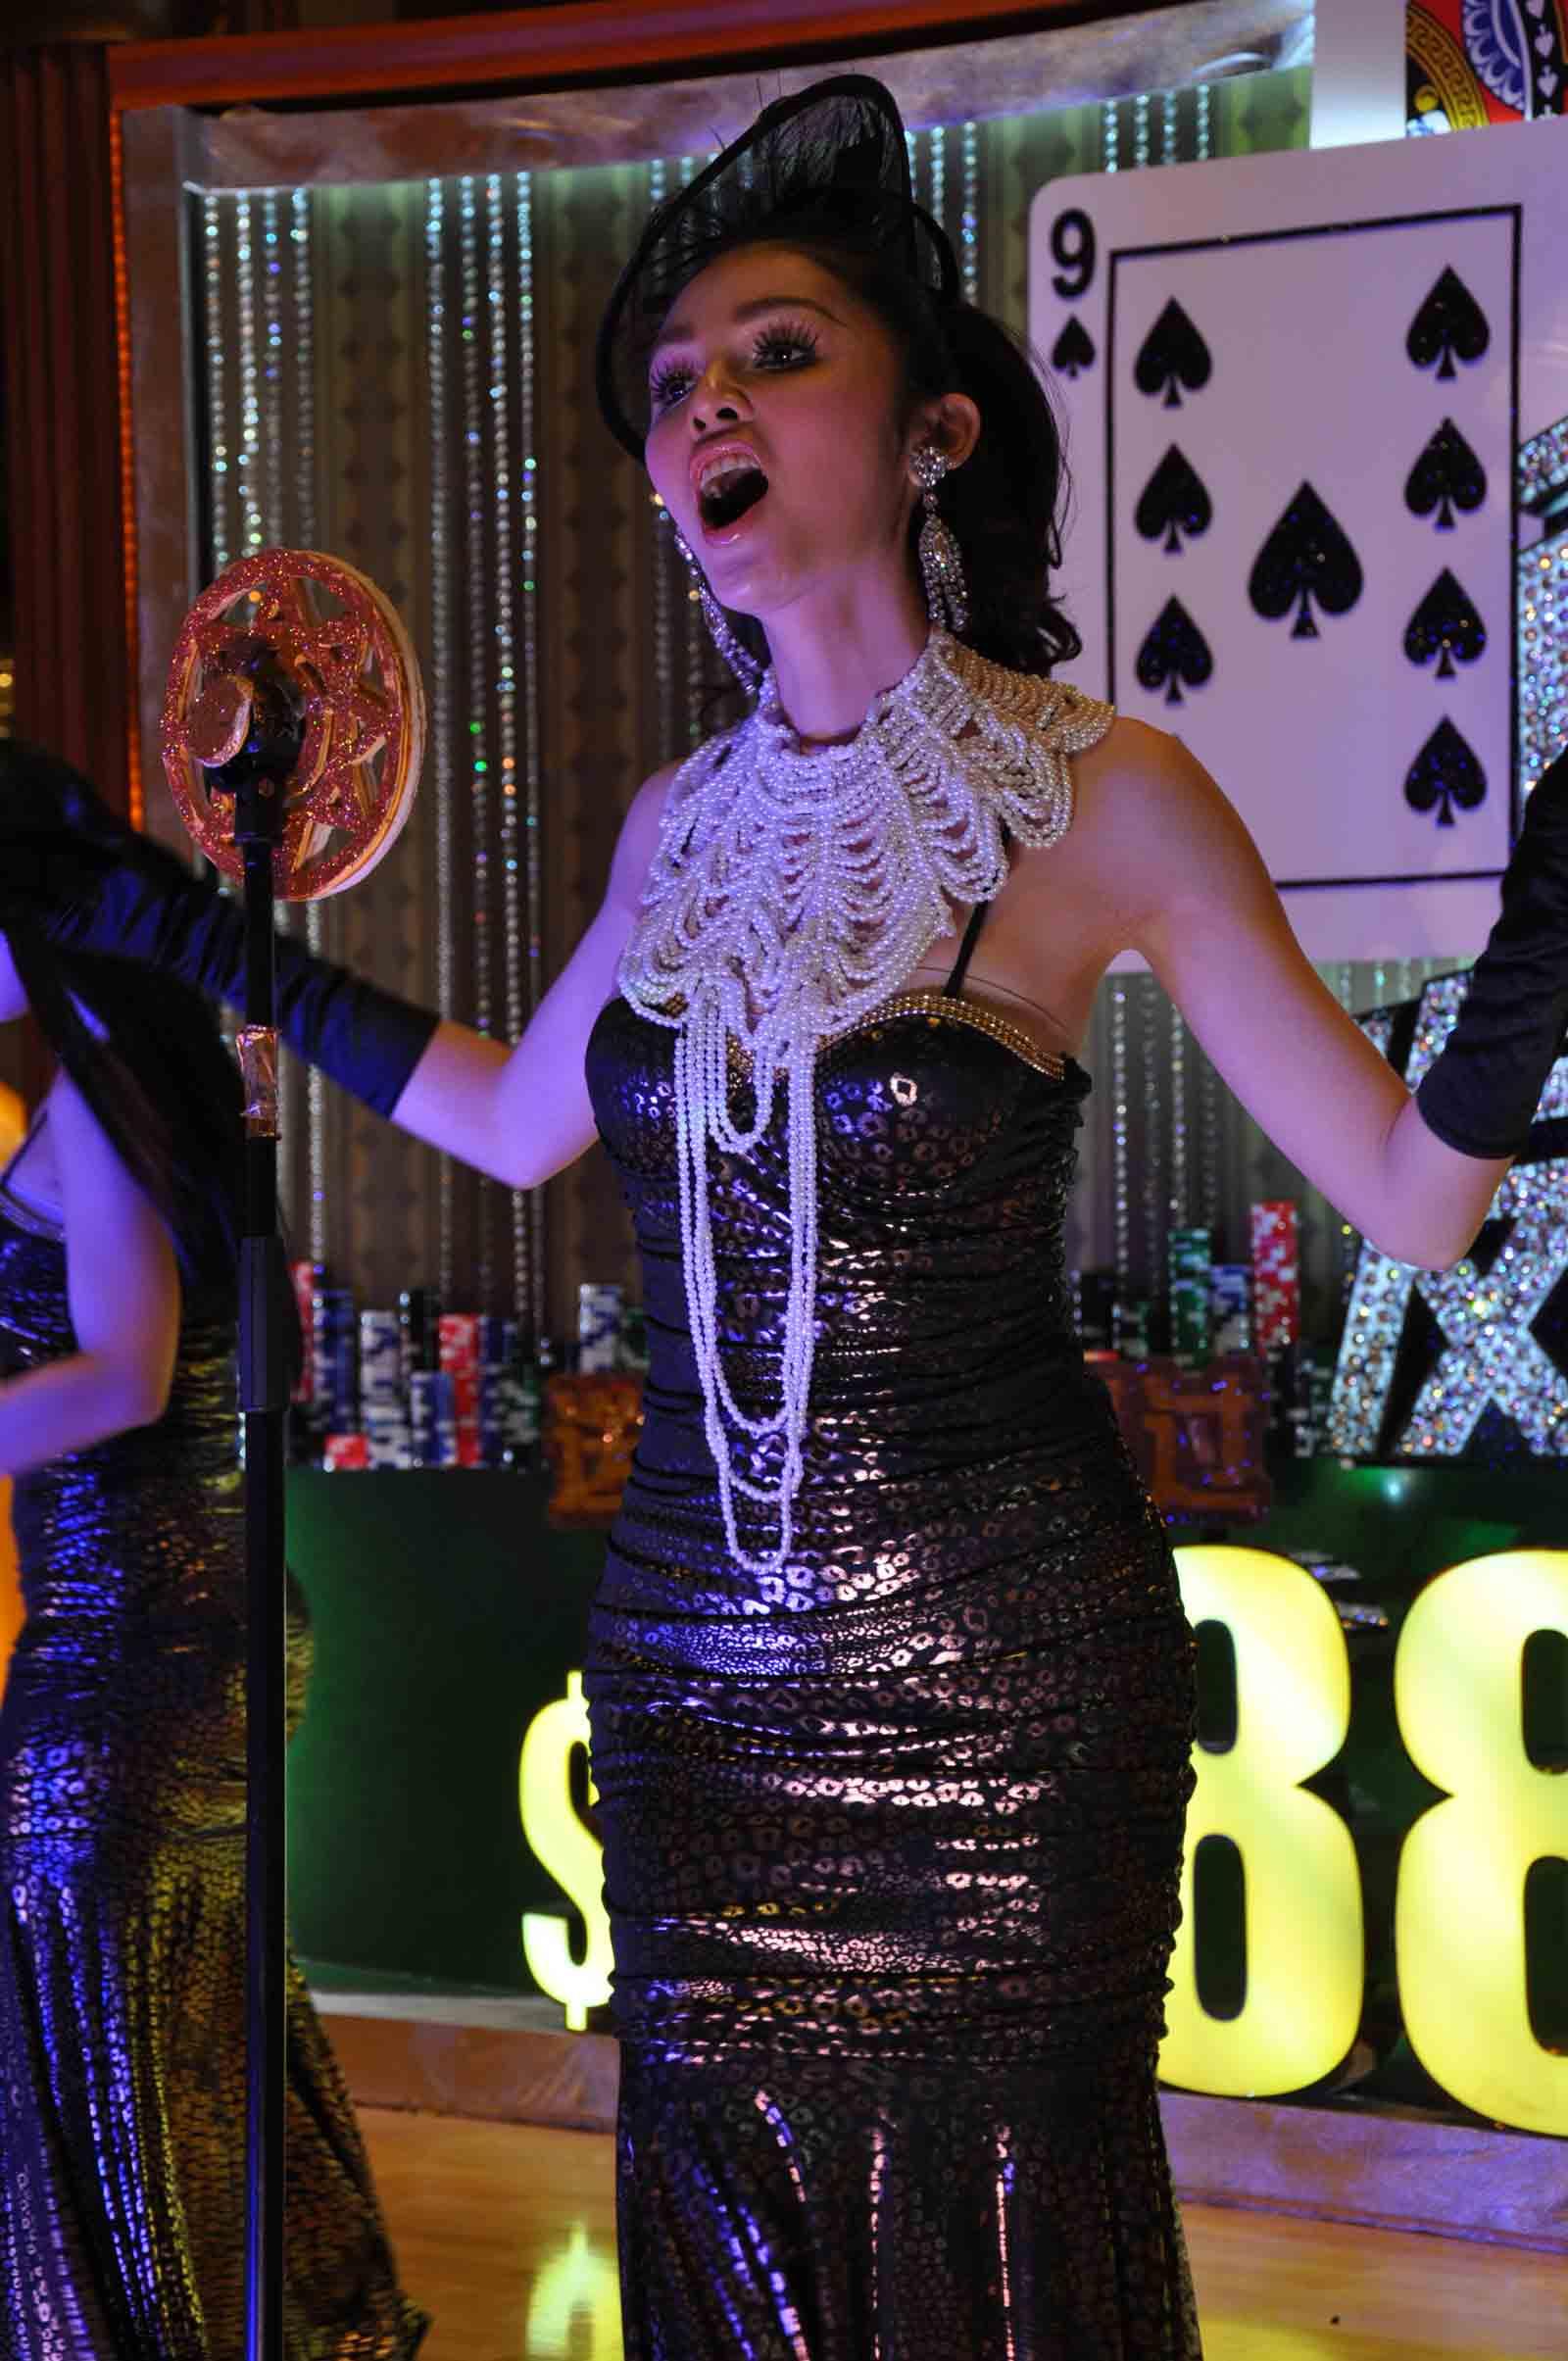 Starworld Macau singer